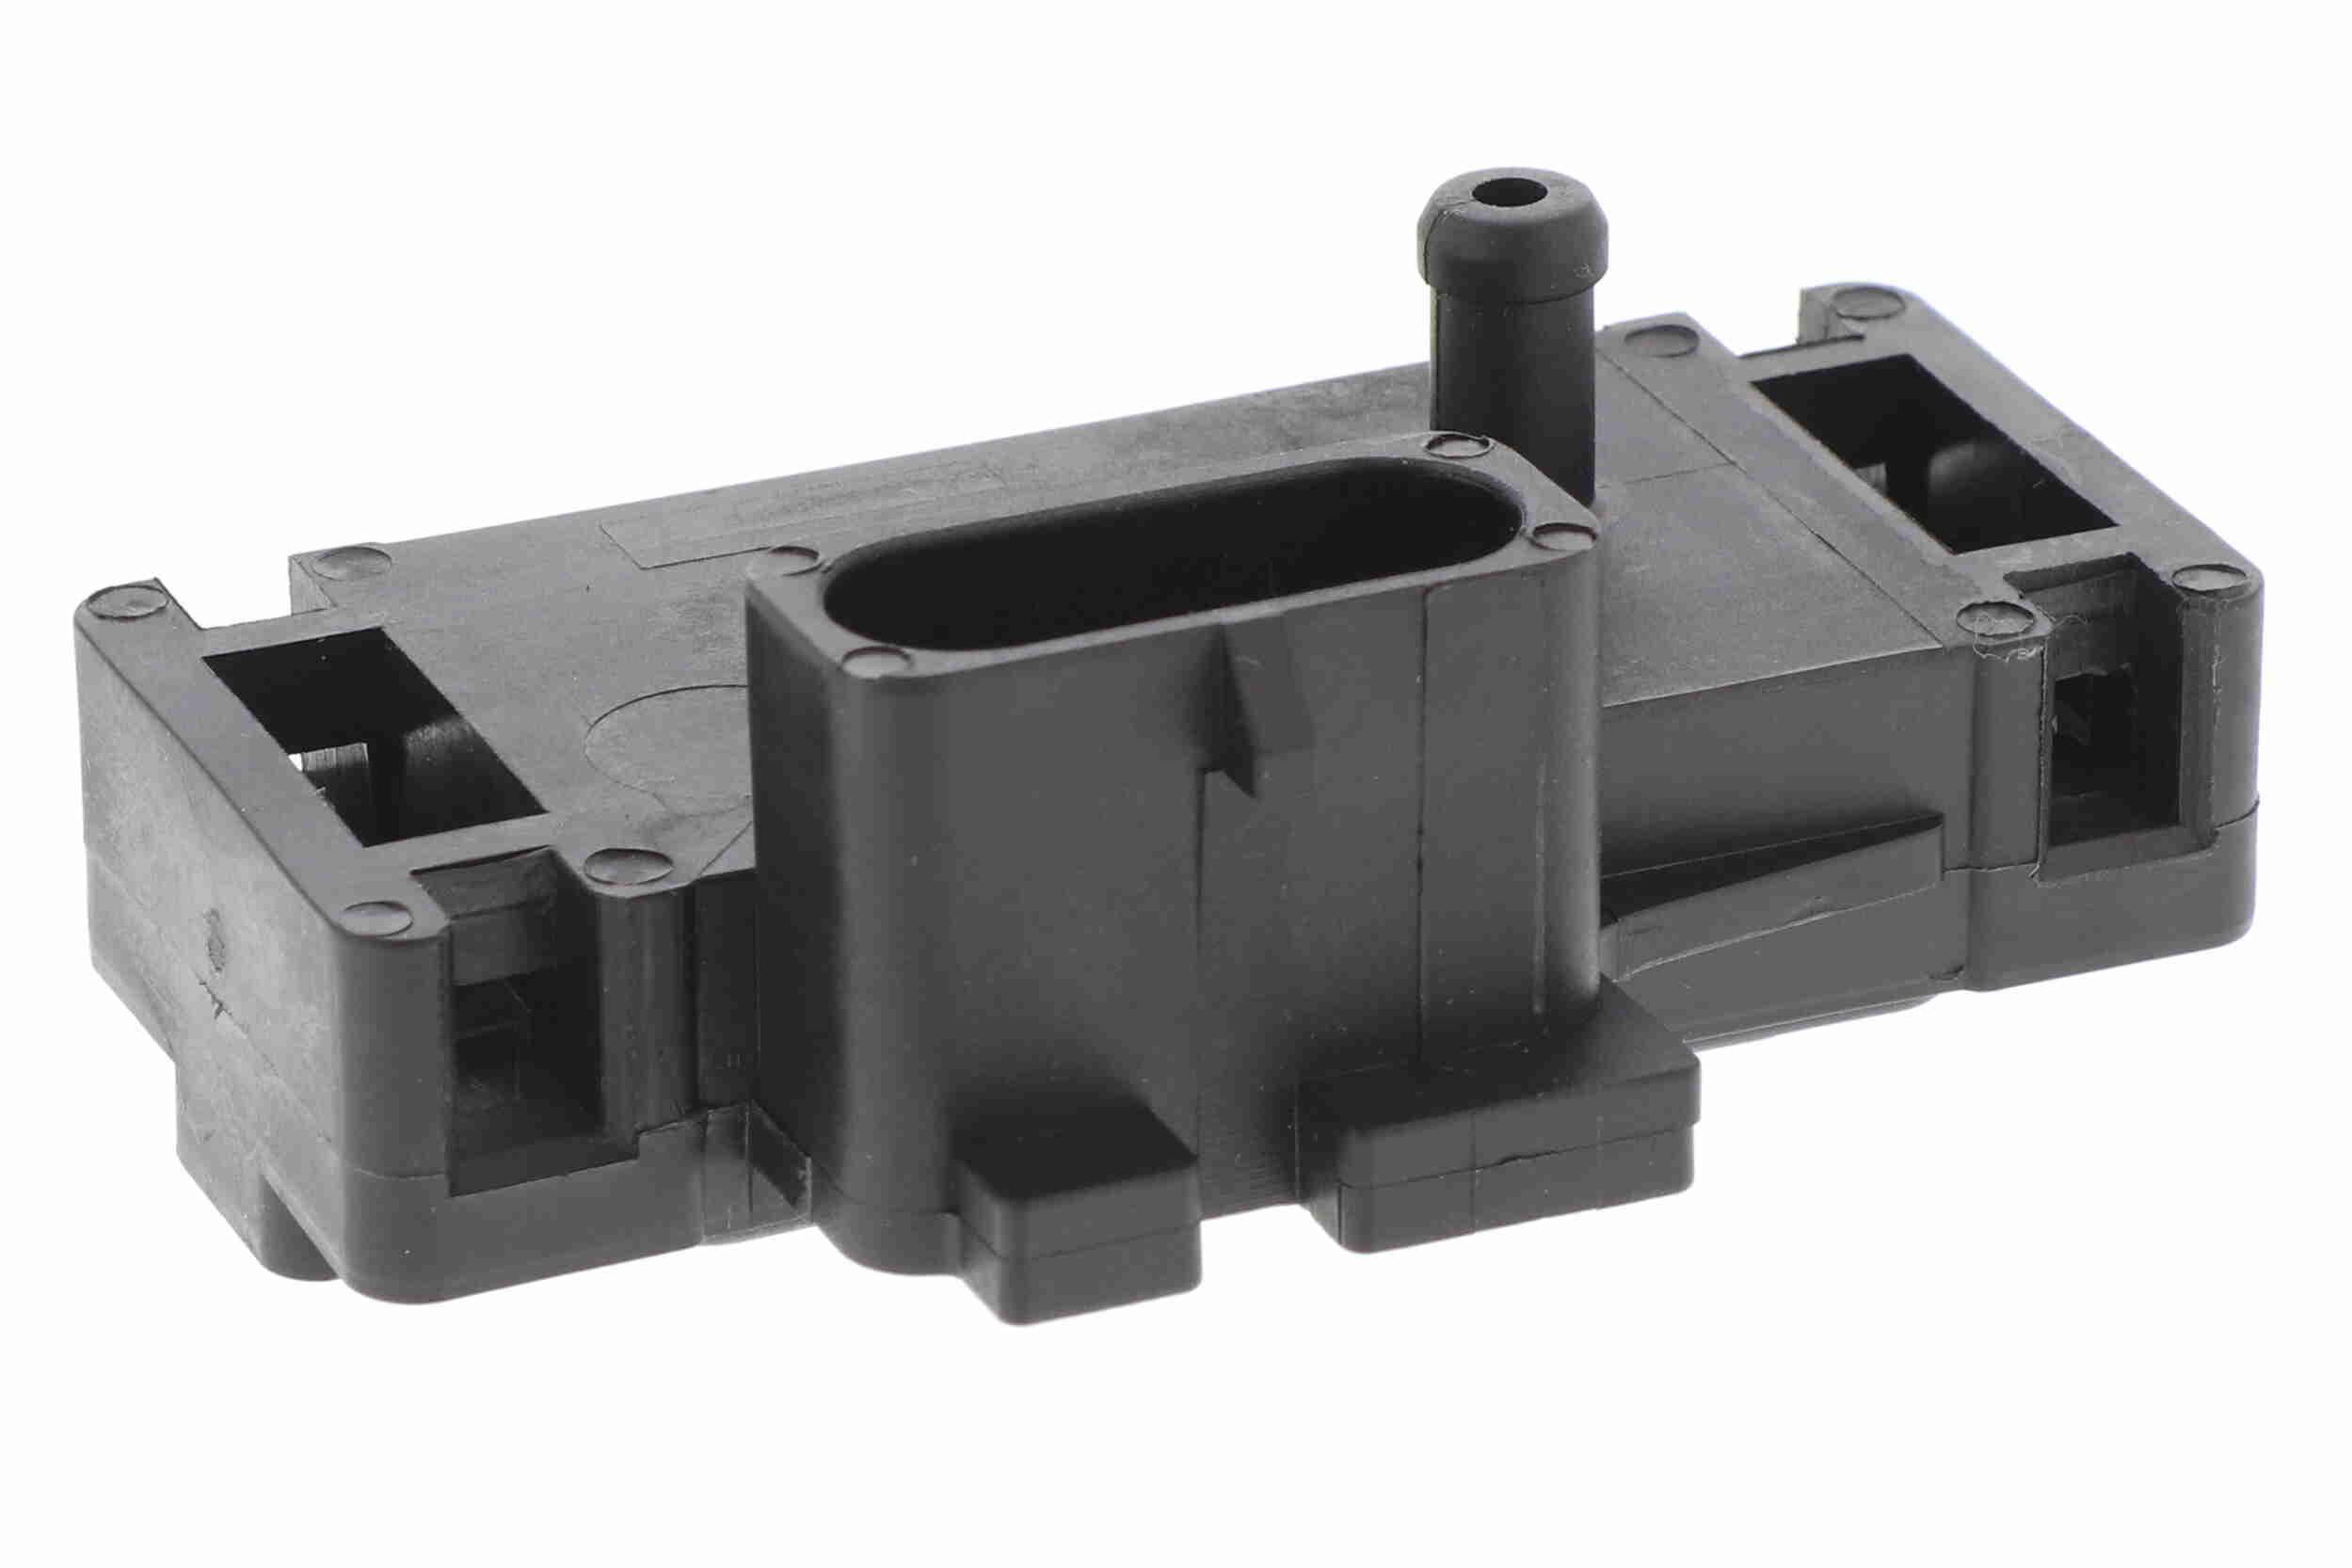 OPEL ASTRA 2019 Sensor, Saugrohrdruck - Original VEMO V40-72-0323 Pol-Anzahl: 3-polig